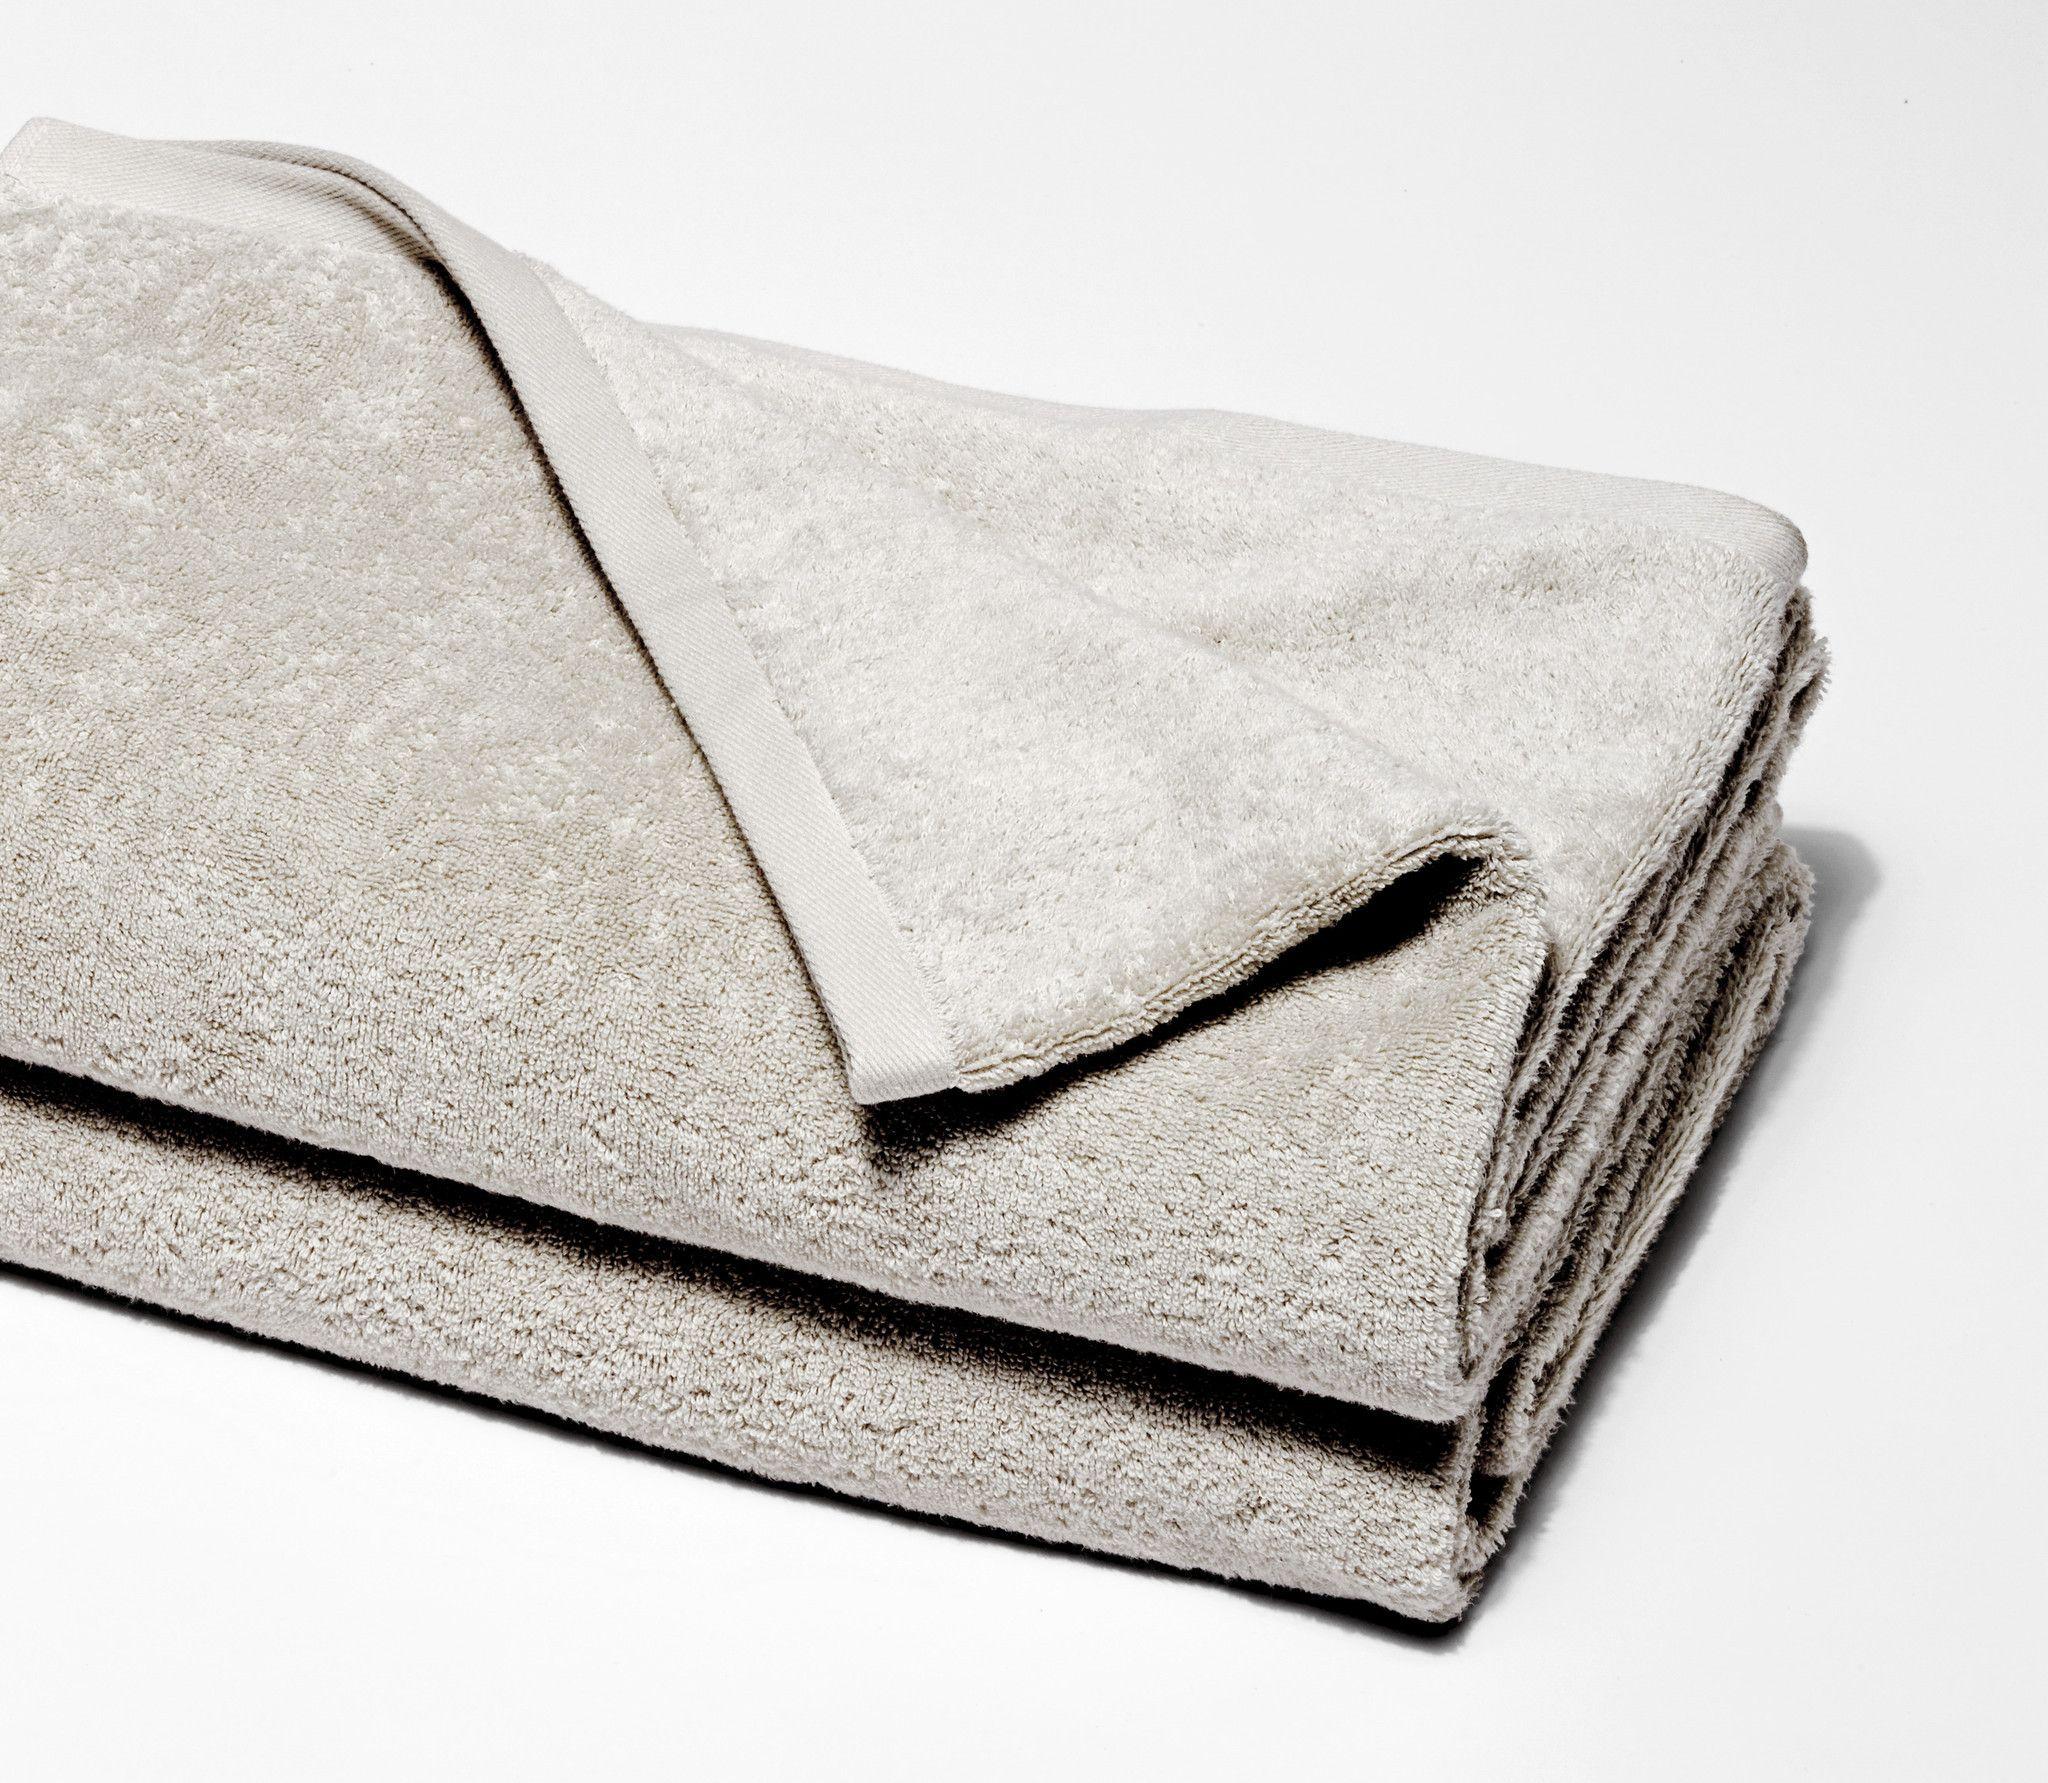 Bath Sheets from SNOWE